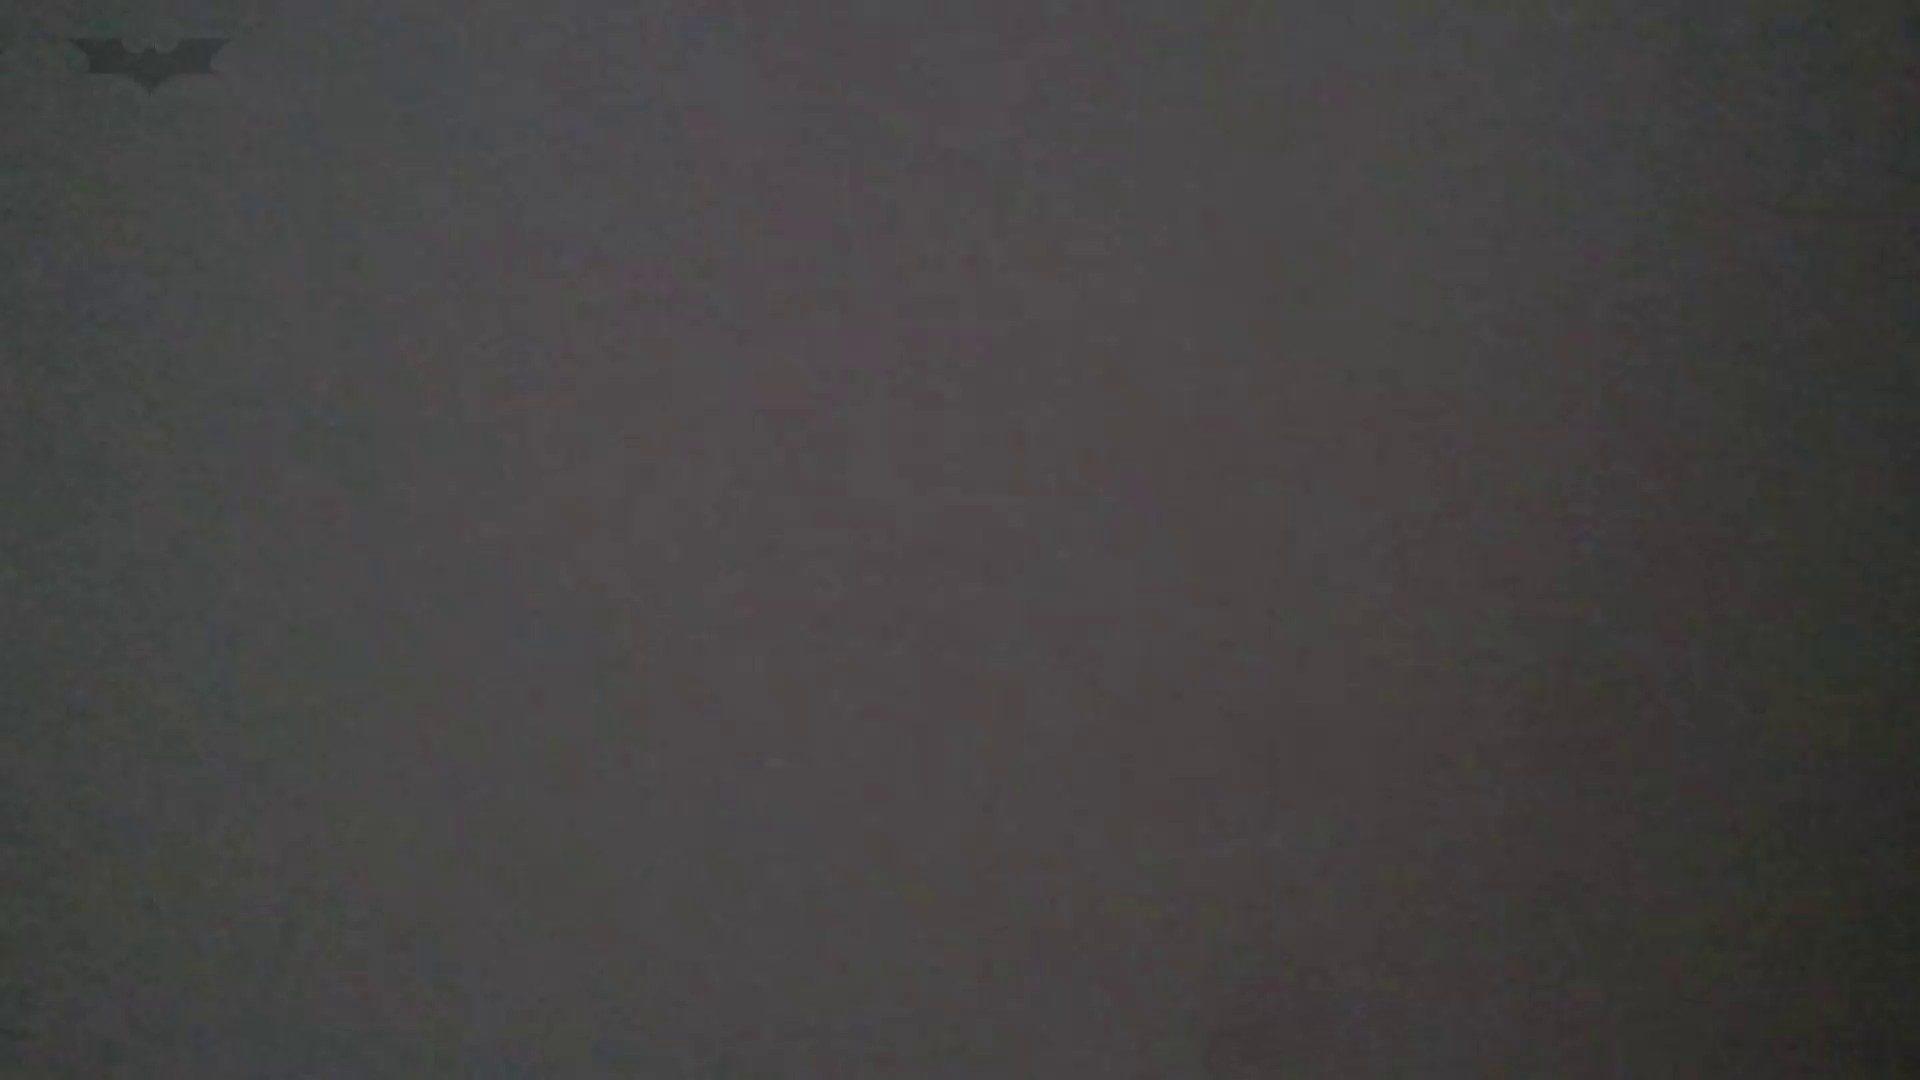 化粧室絵巻 番外編 VOL.23 細身女性 おめこ無修正動画無料 110画像 4